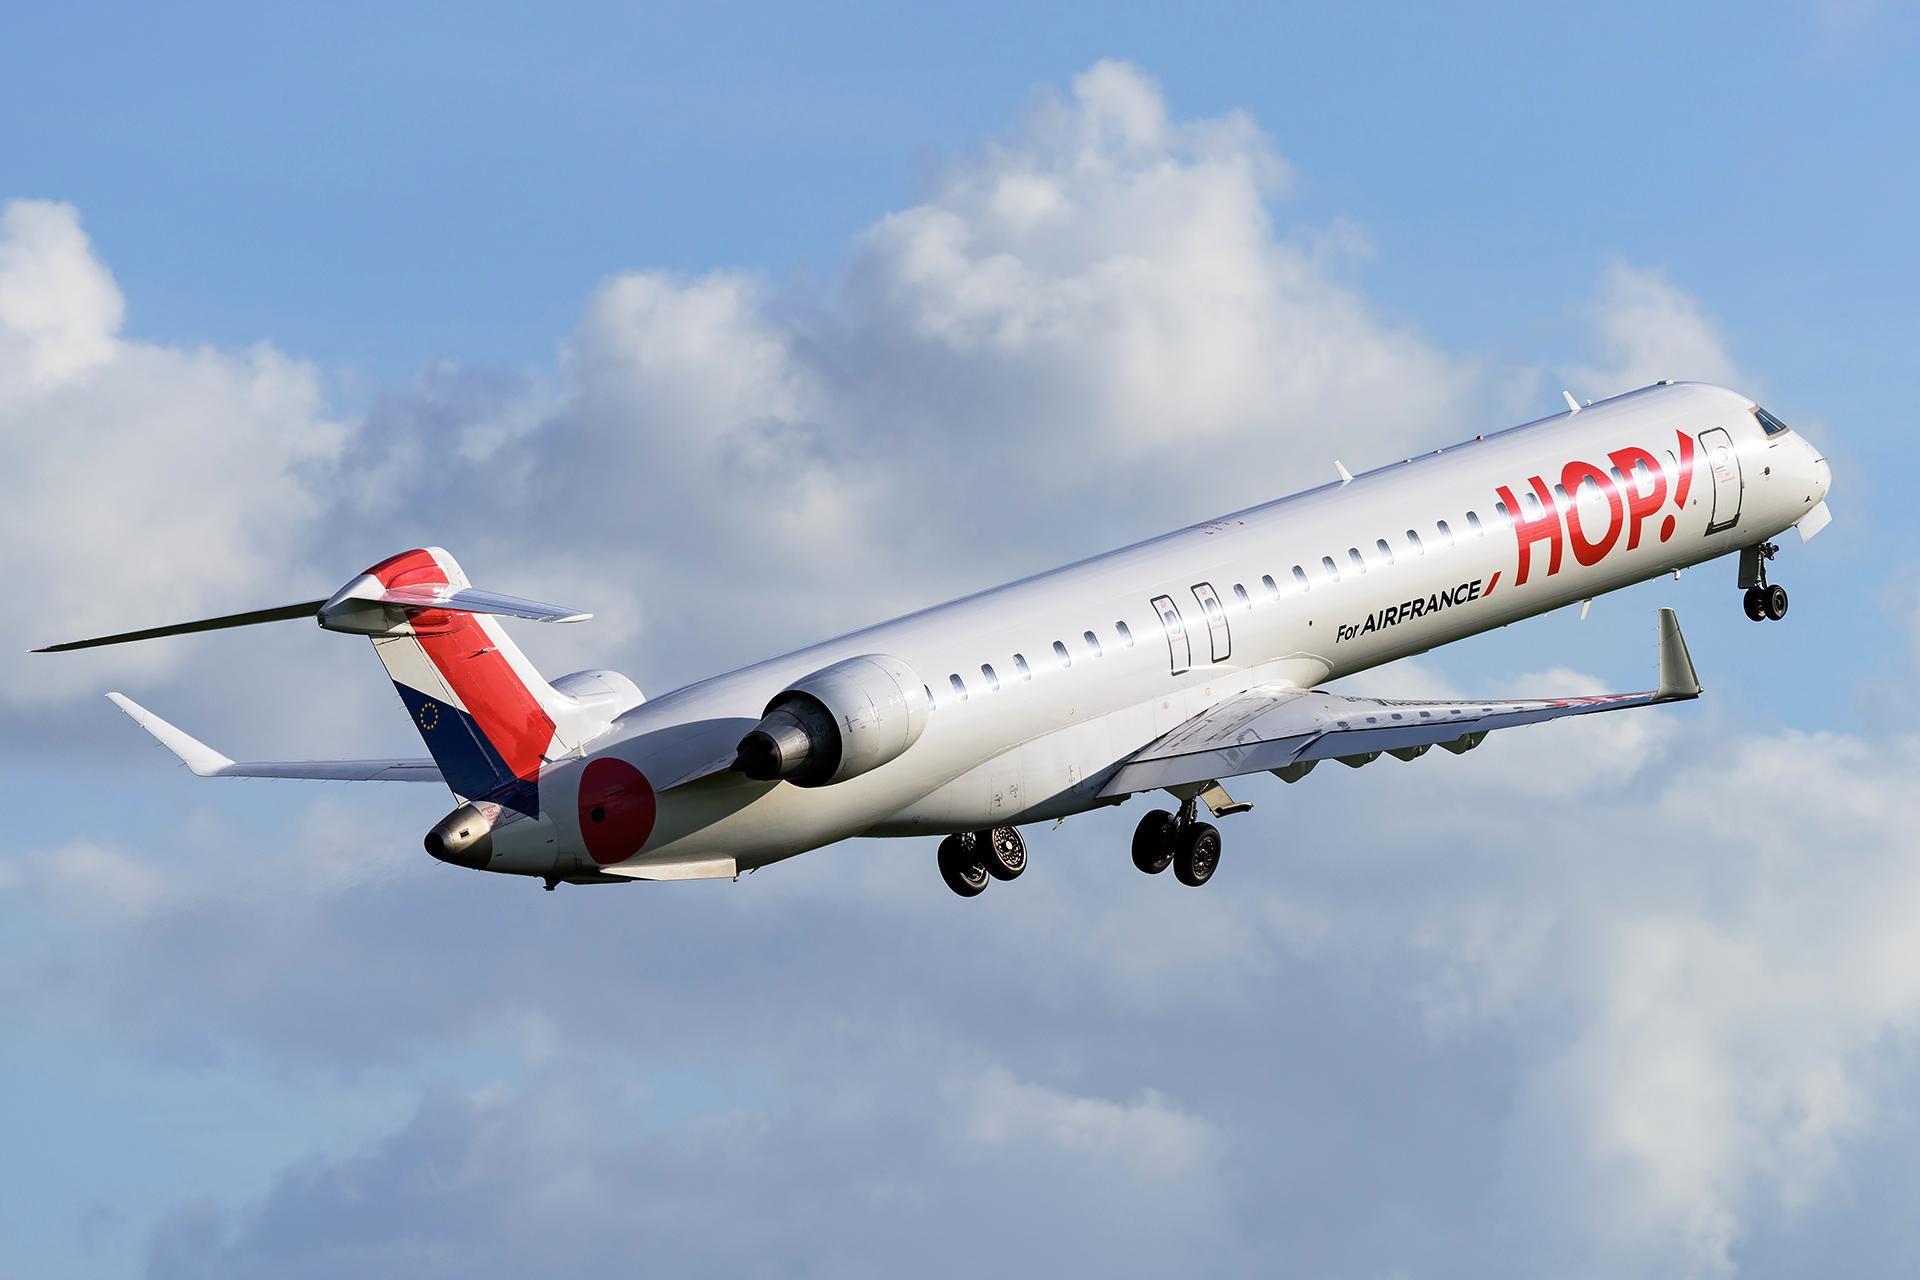 Bombardier CRJ1000 Air France HOP